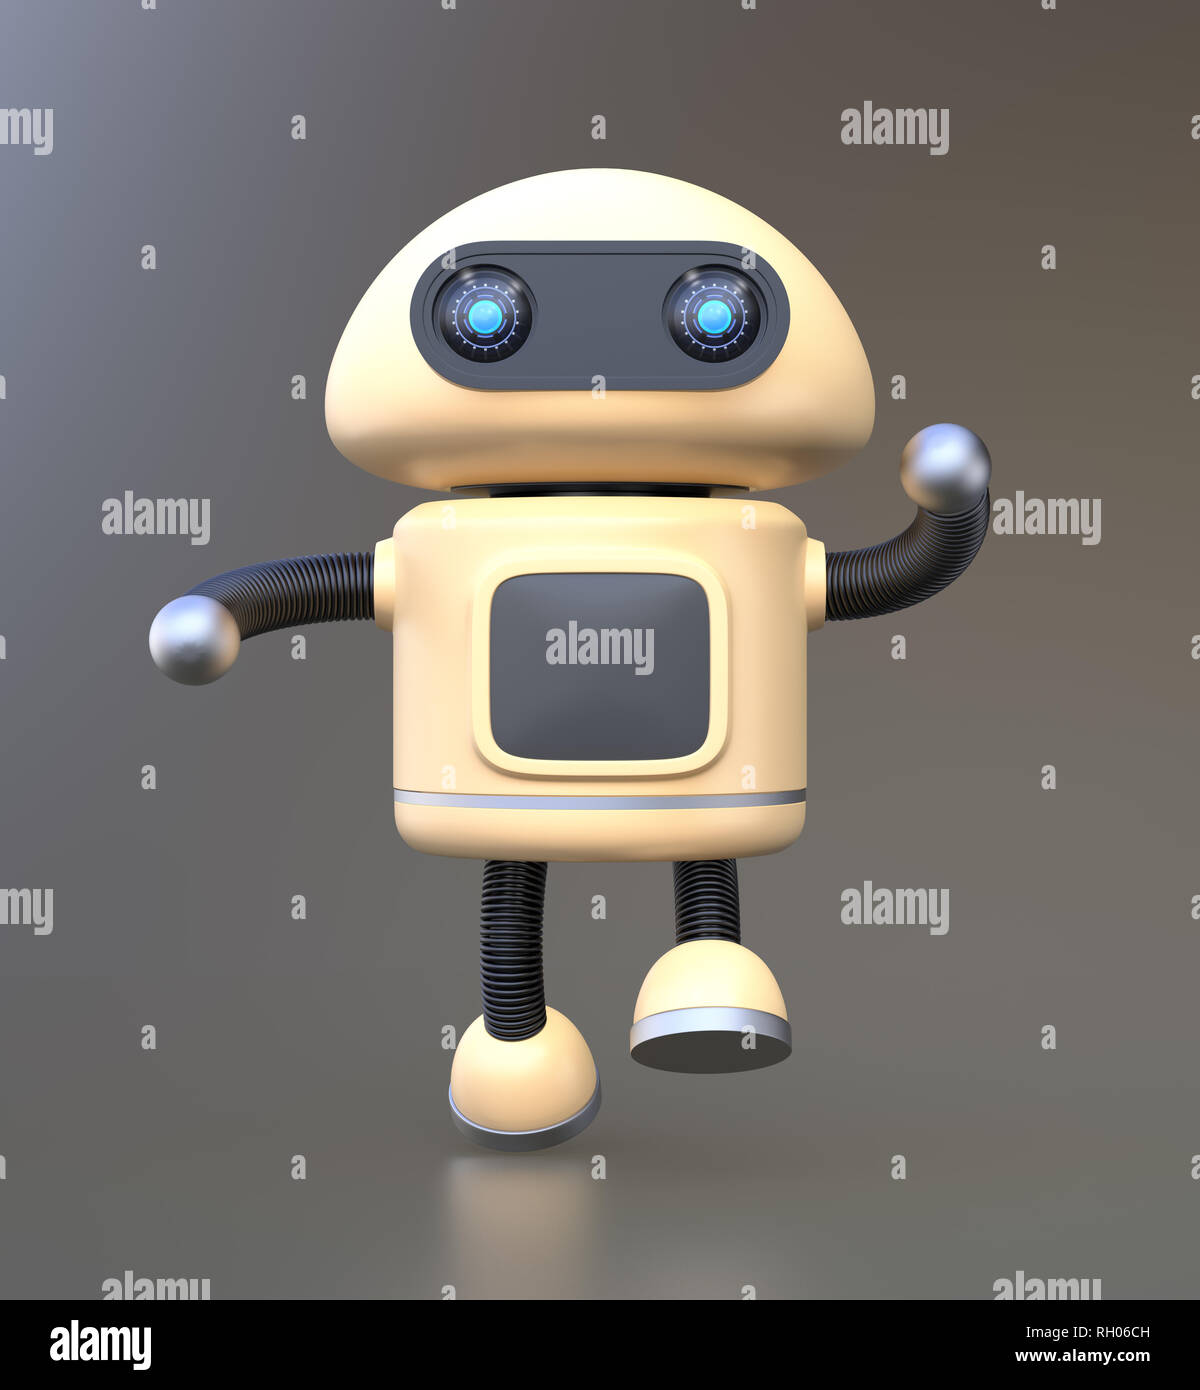 Cartoon Robot Droid Illustration Stock Photos & Cartoon